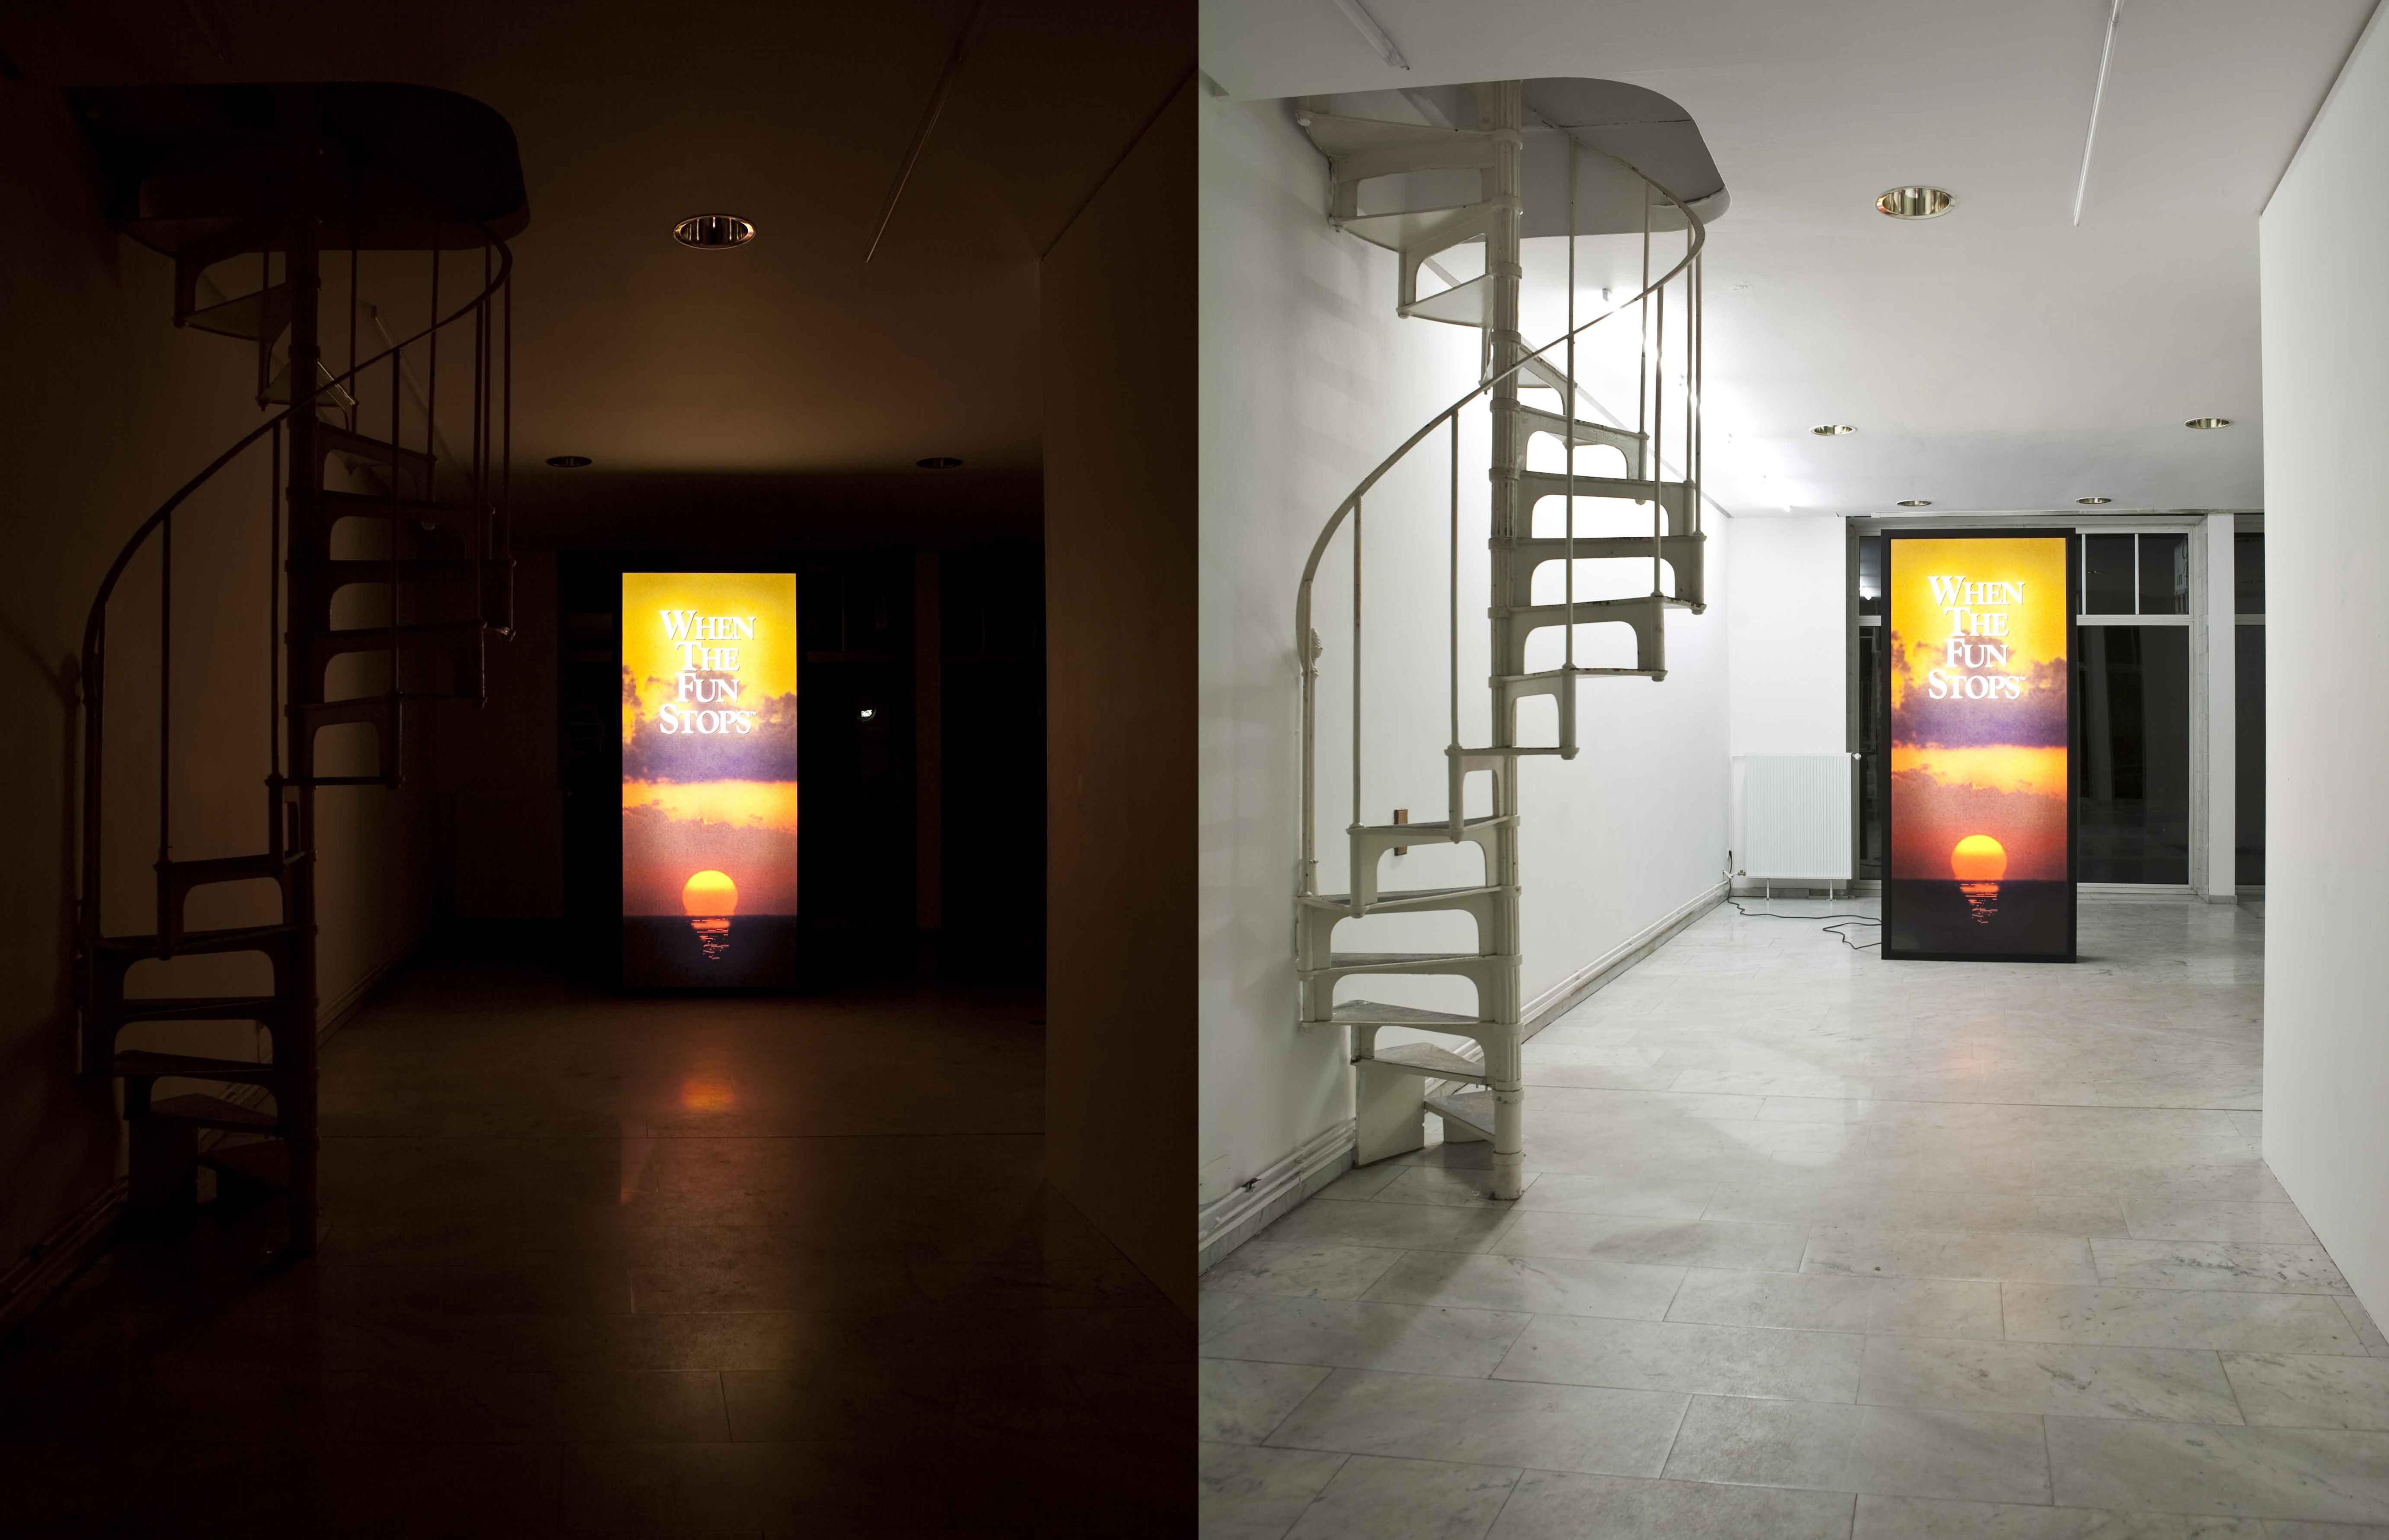 Cayetano Ferrer, Problem Gambling Monolith, 2008, MDF, duratranst, print on acrylic, fluorescent lights